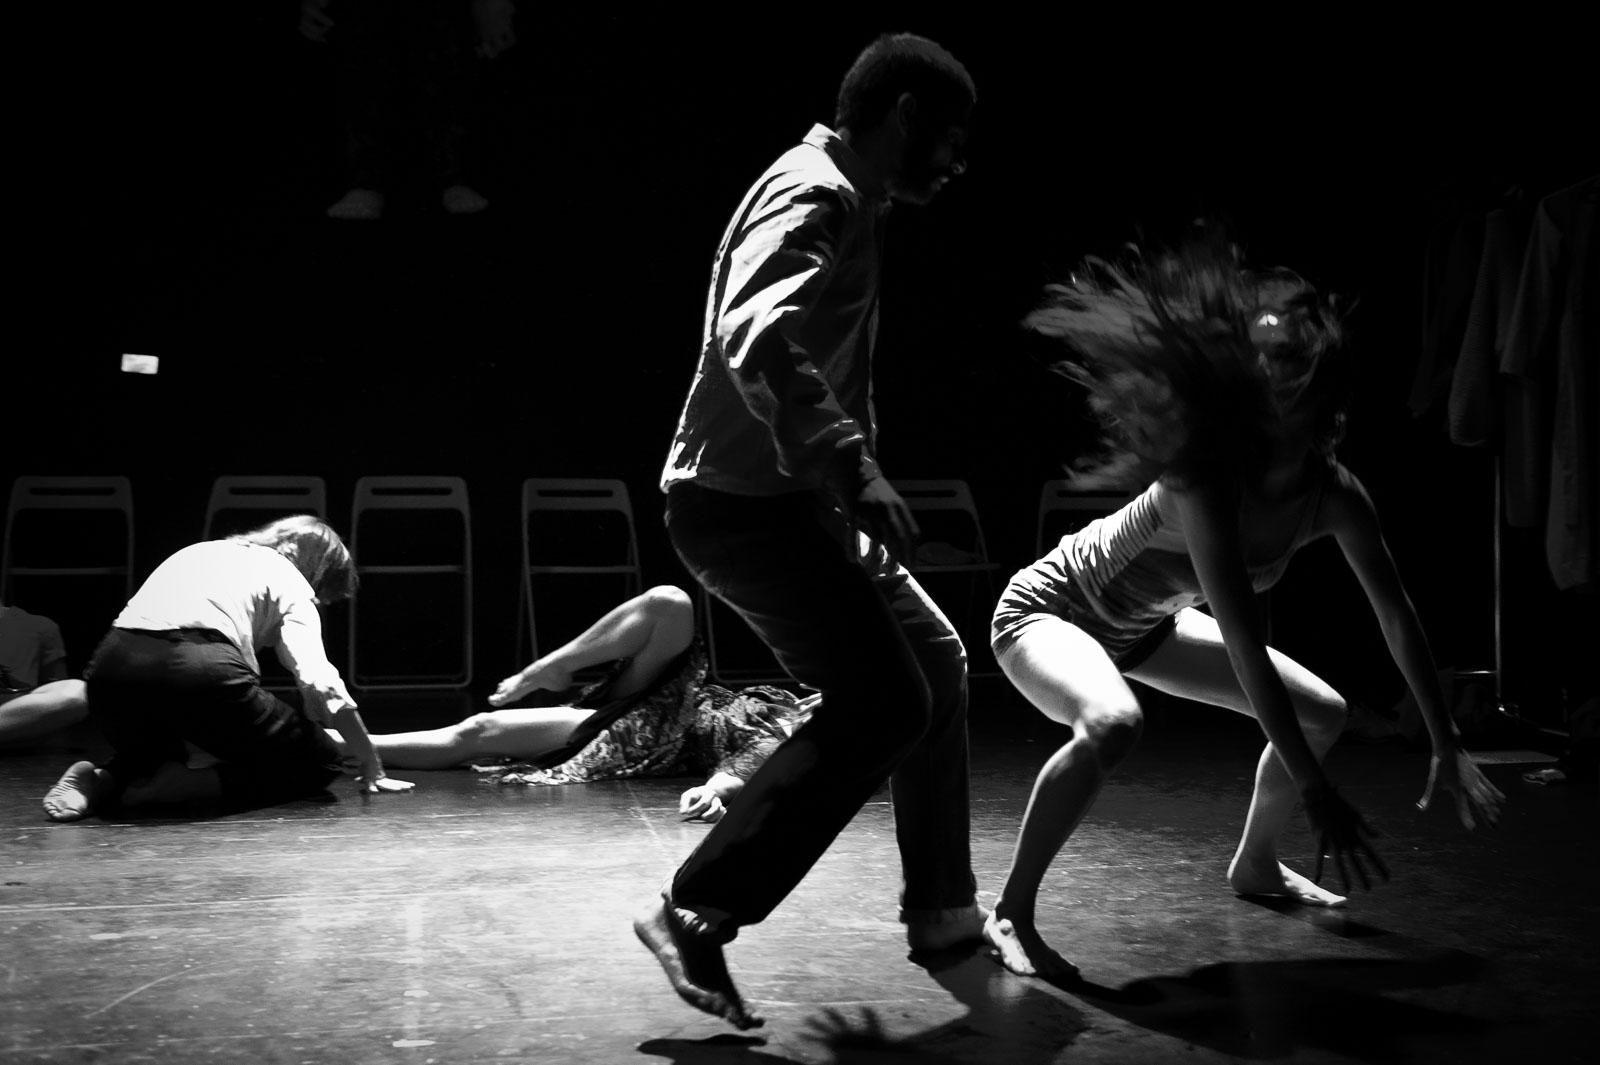 20161020-teatro1422-Edit.jpg